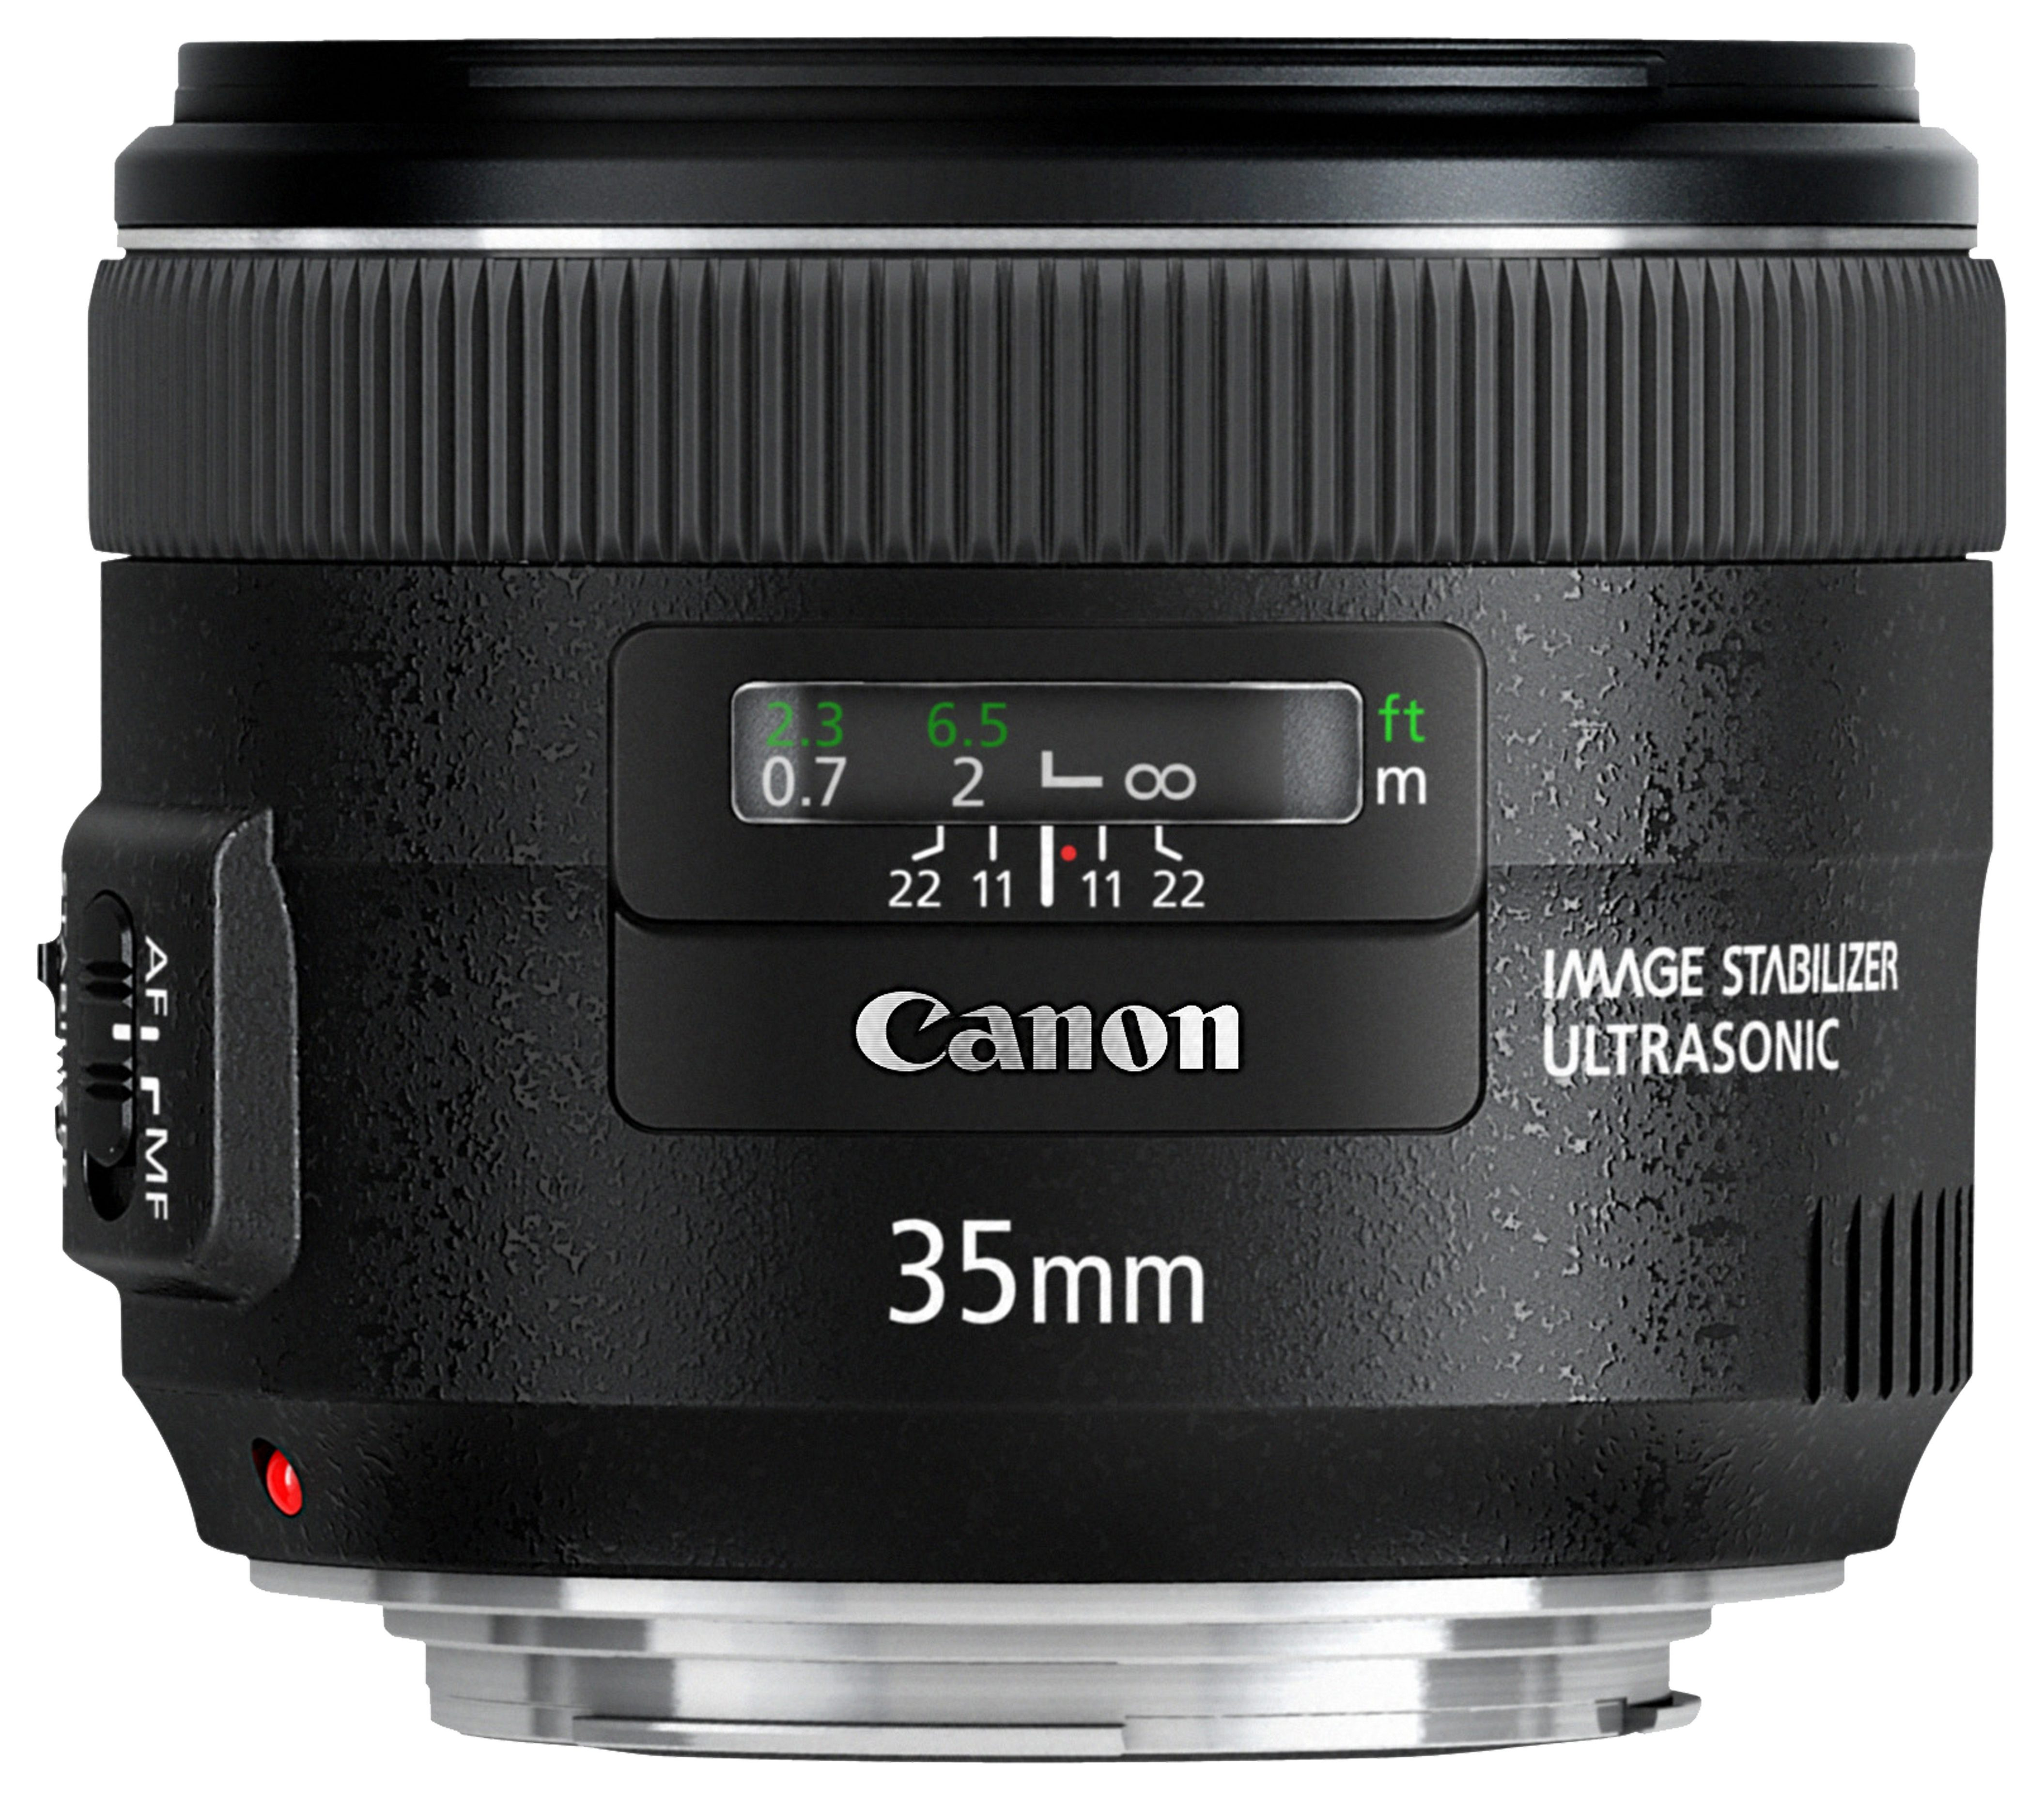 Canon EF 35mm f/2 IS USM Festbrennweite Objektiv